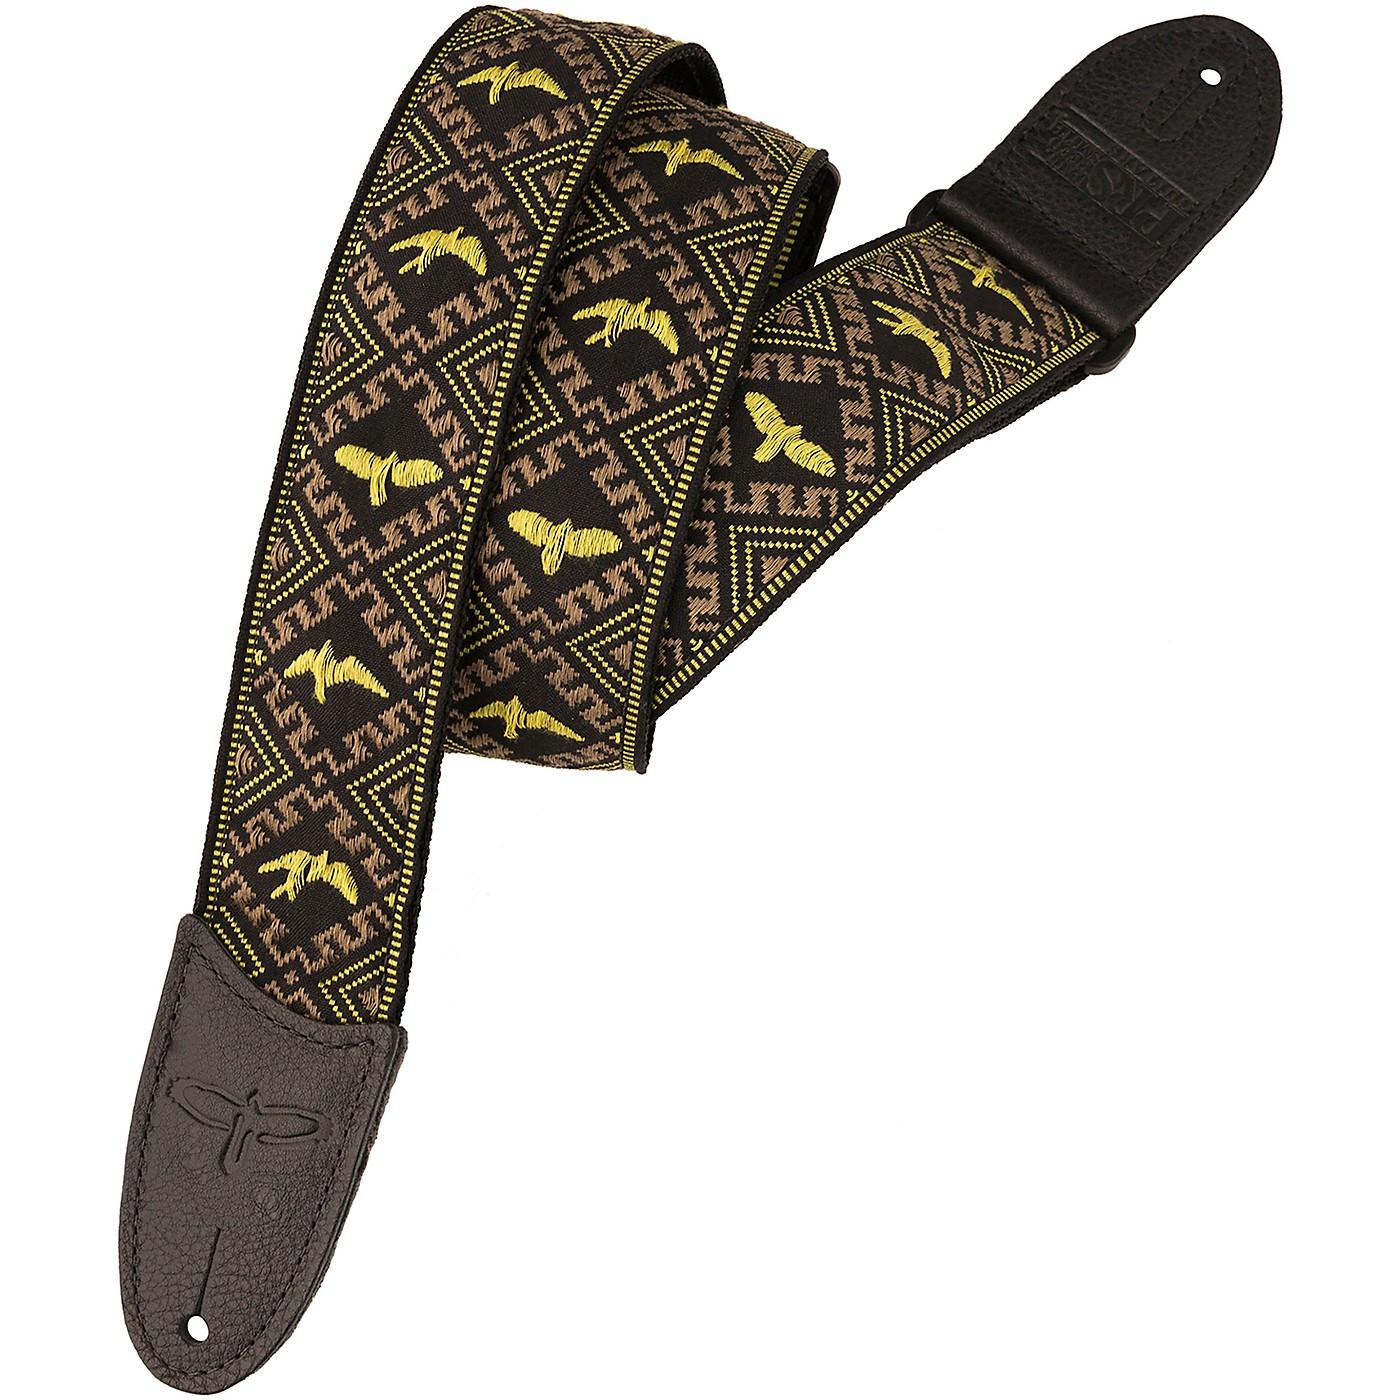 PRS PRS Jacquard Hootenanny Style Guitar Strap, Yellow & Black Birds thumbnail